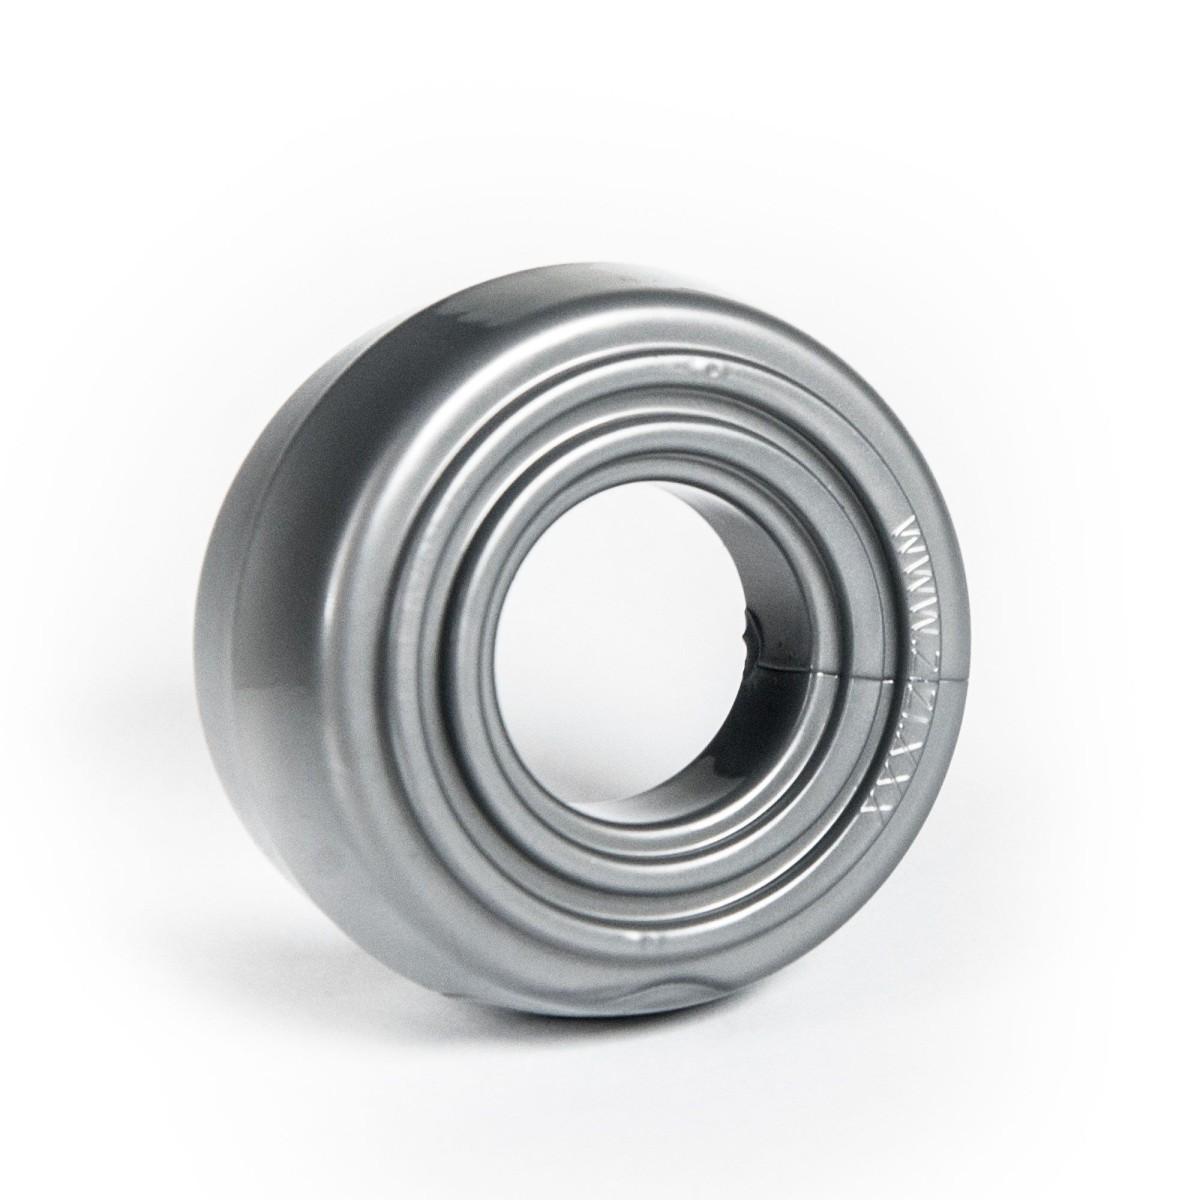 Zizi Accelerator Cock Ring Silver